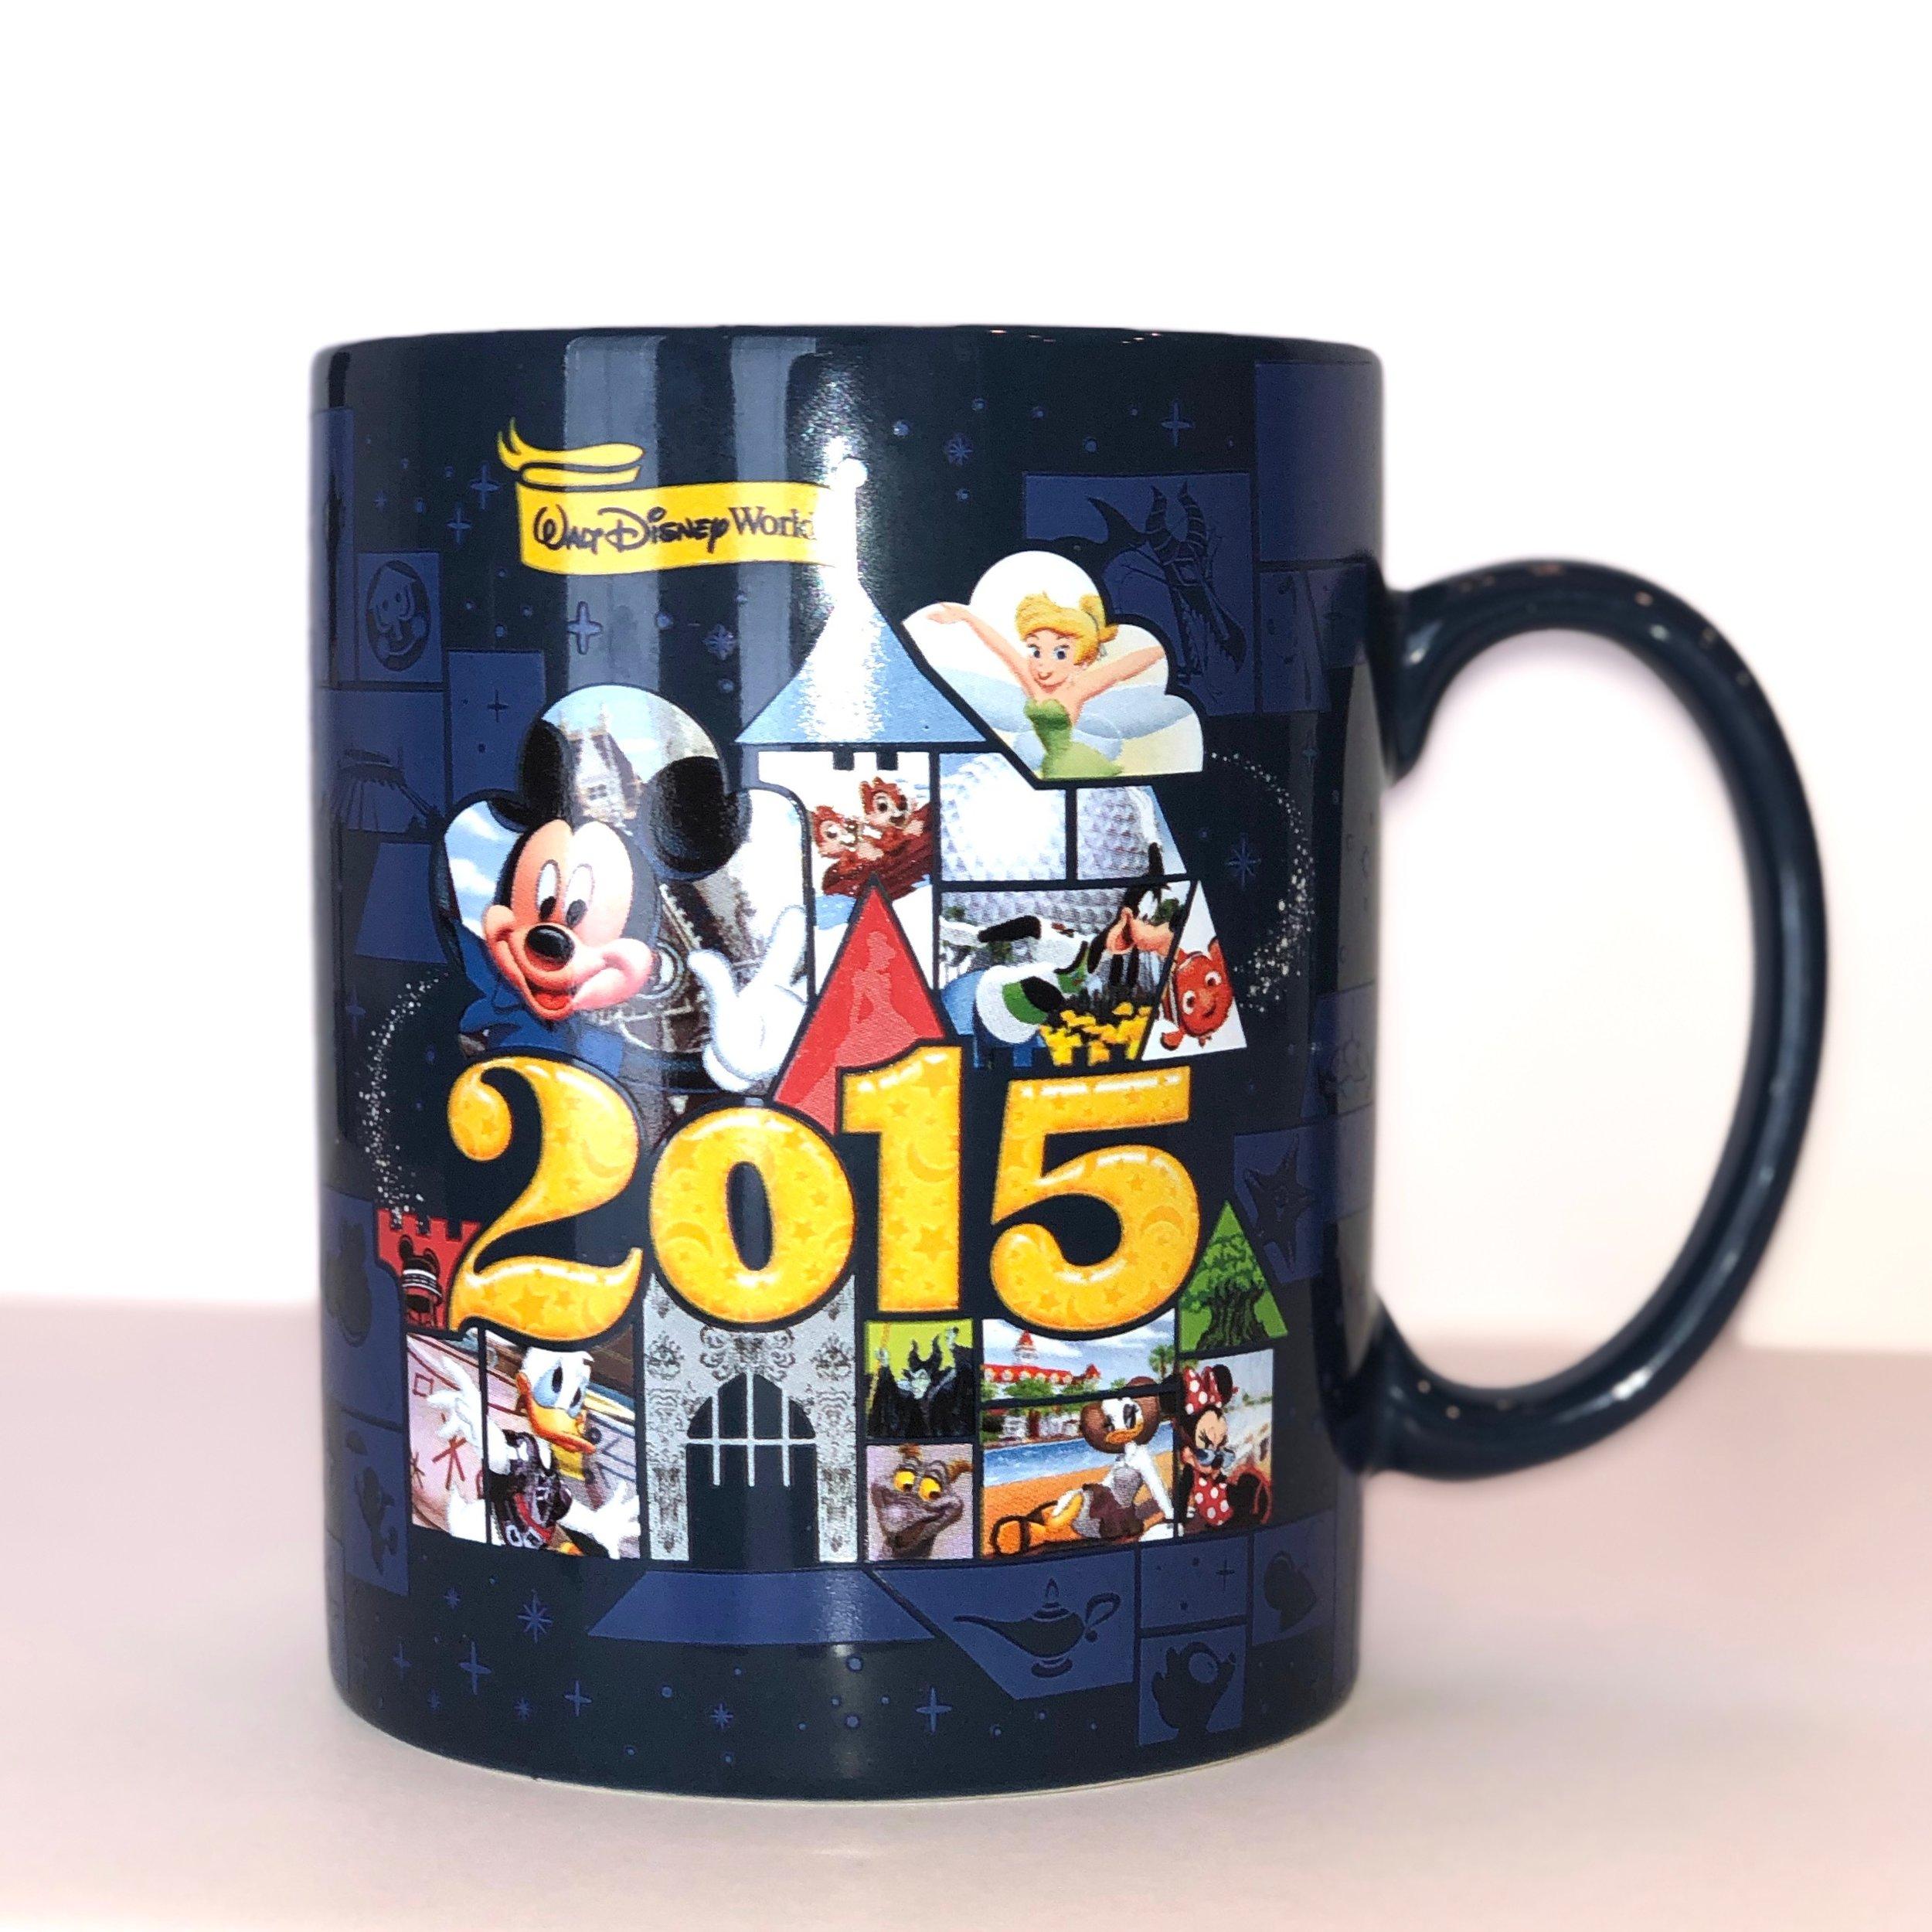 One of my favorite mugs!